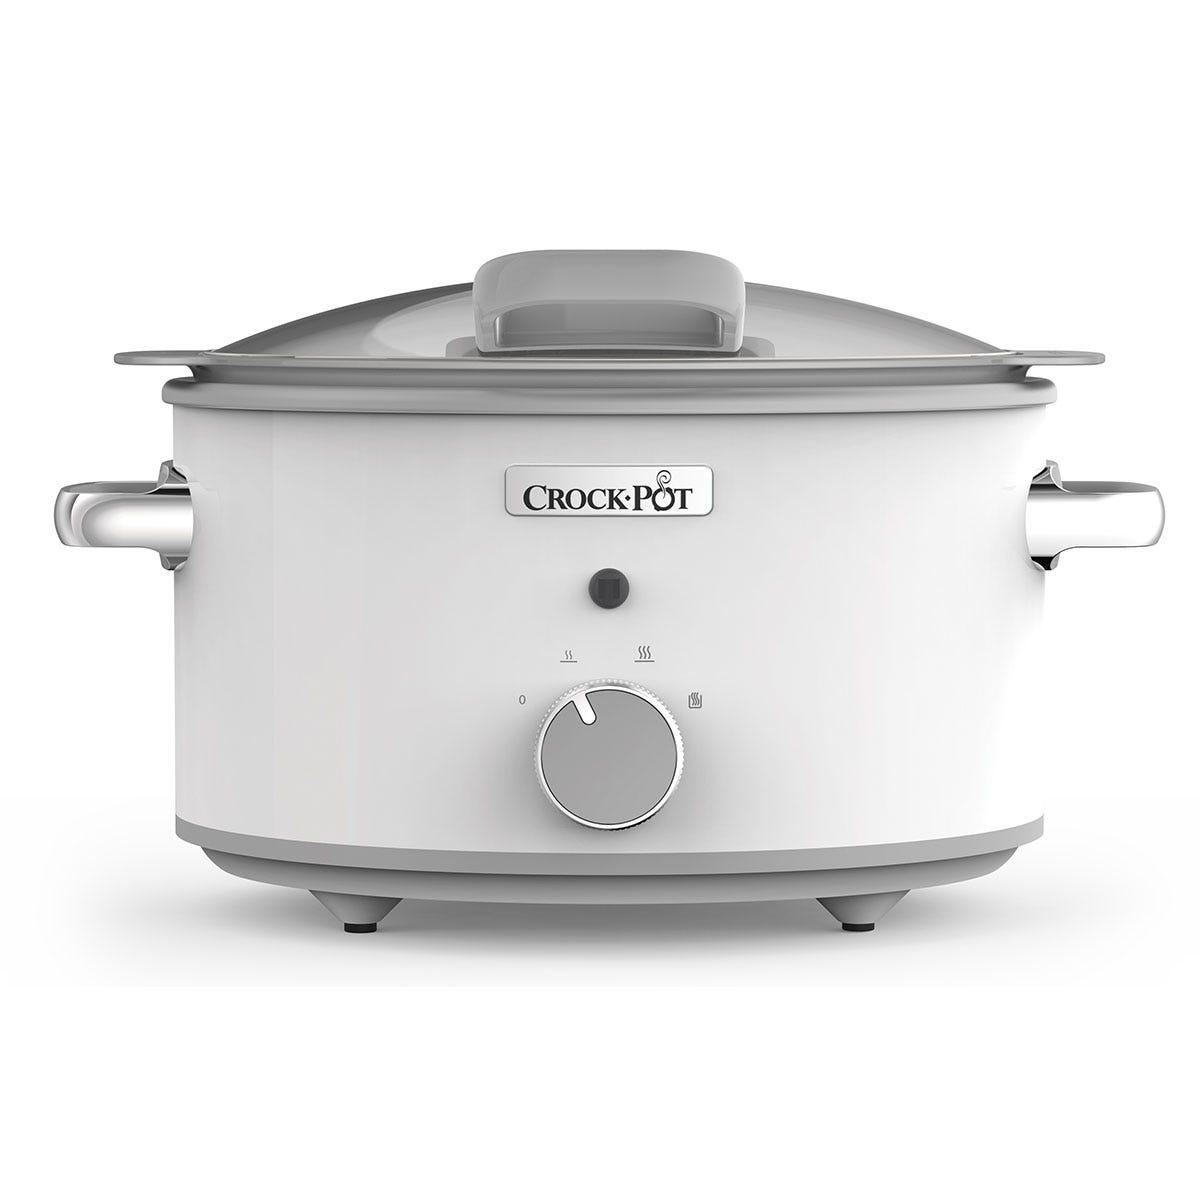 Crock-Pot 4.5L Hinged-Lid DuraCeramic Saute Slow Cooker - White